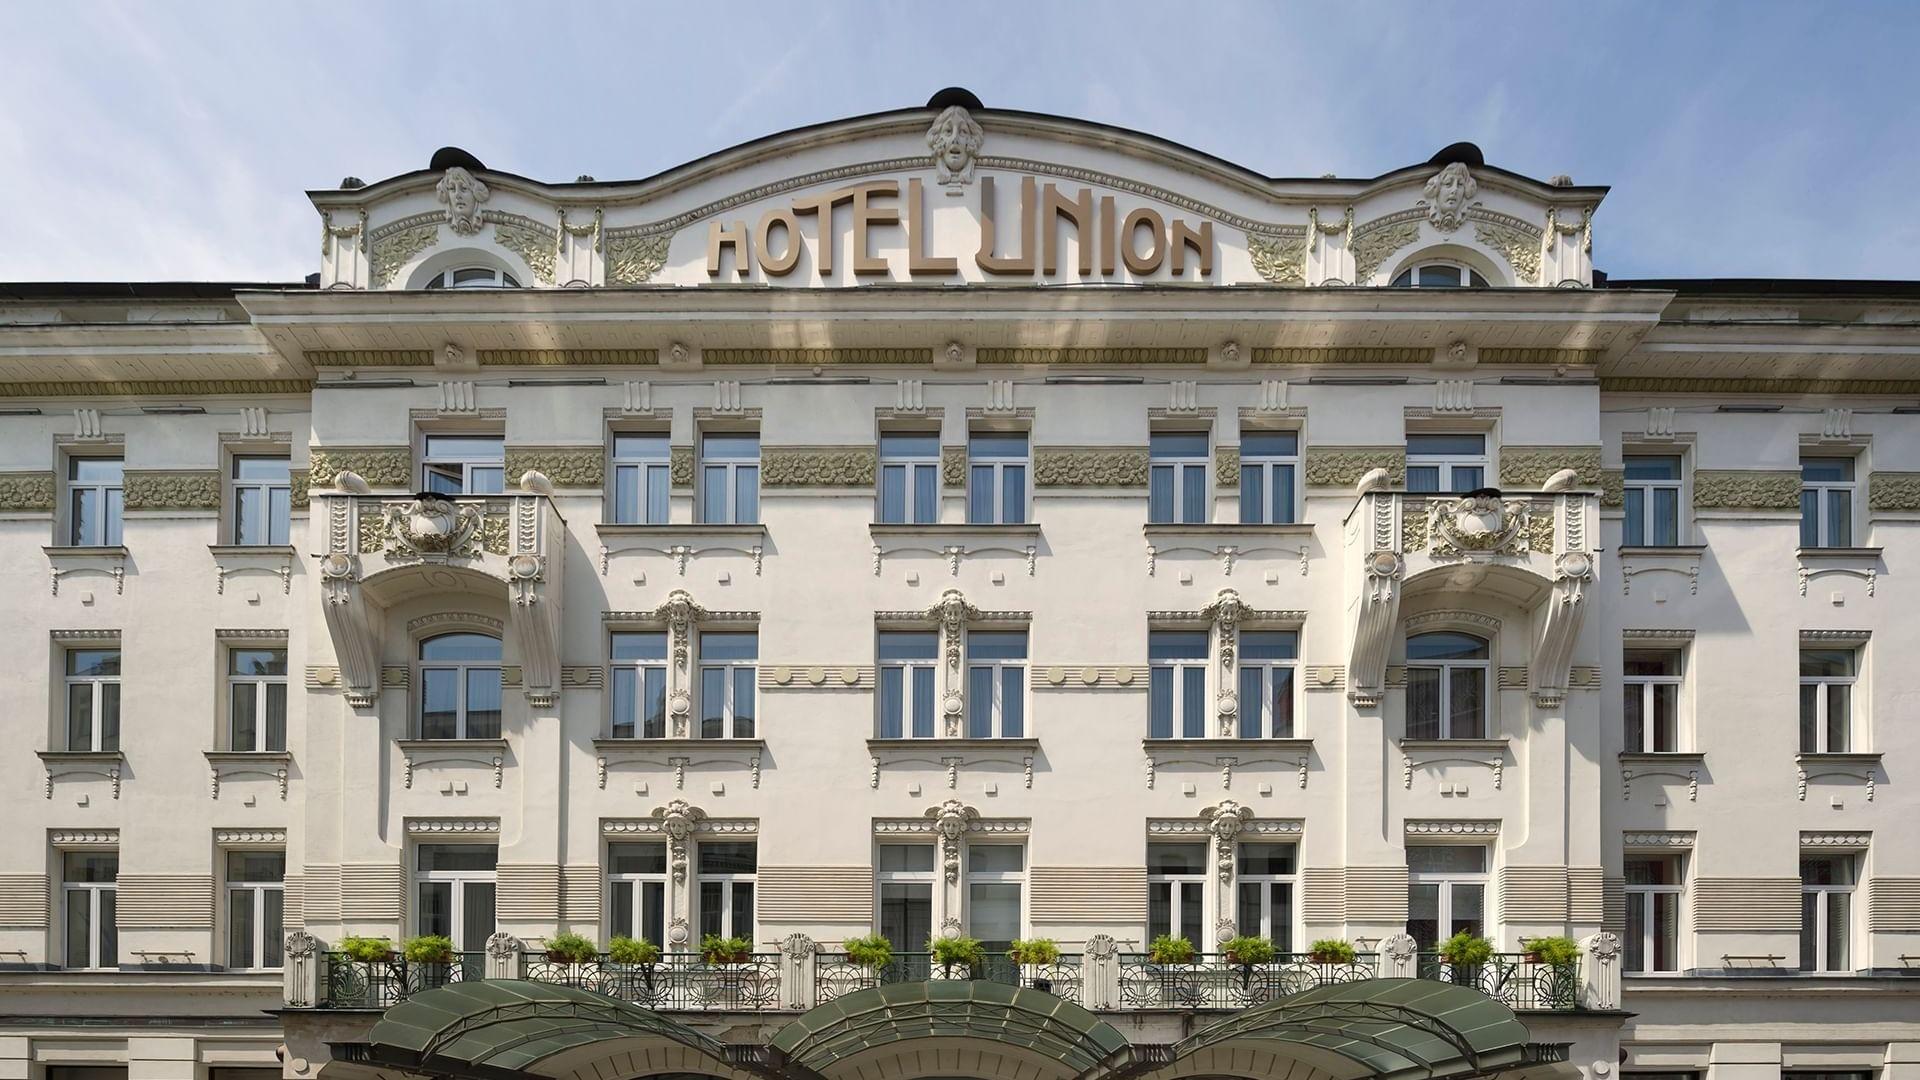 Exterior Grand hotel Union